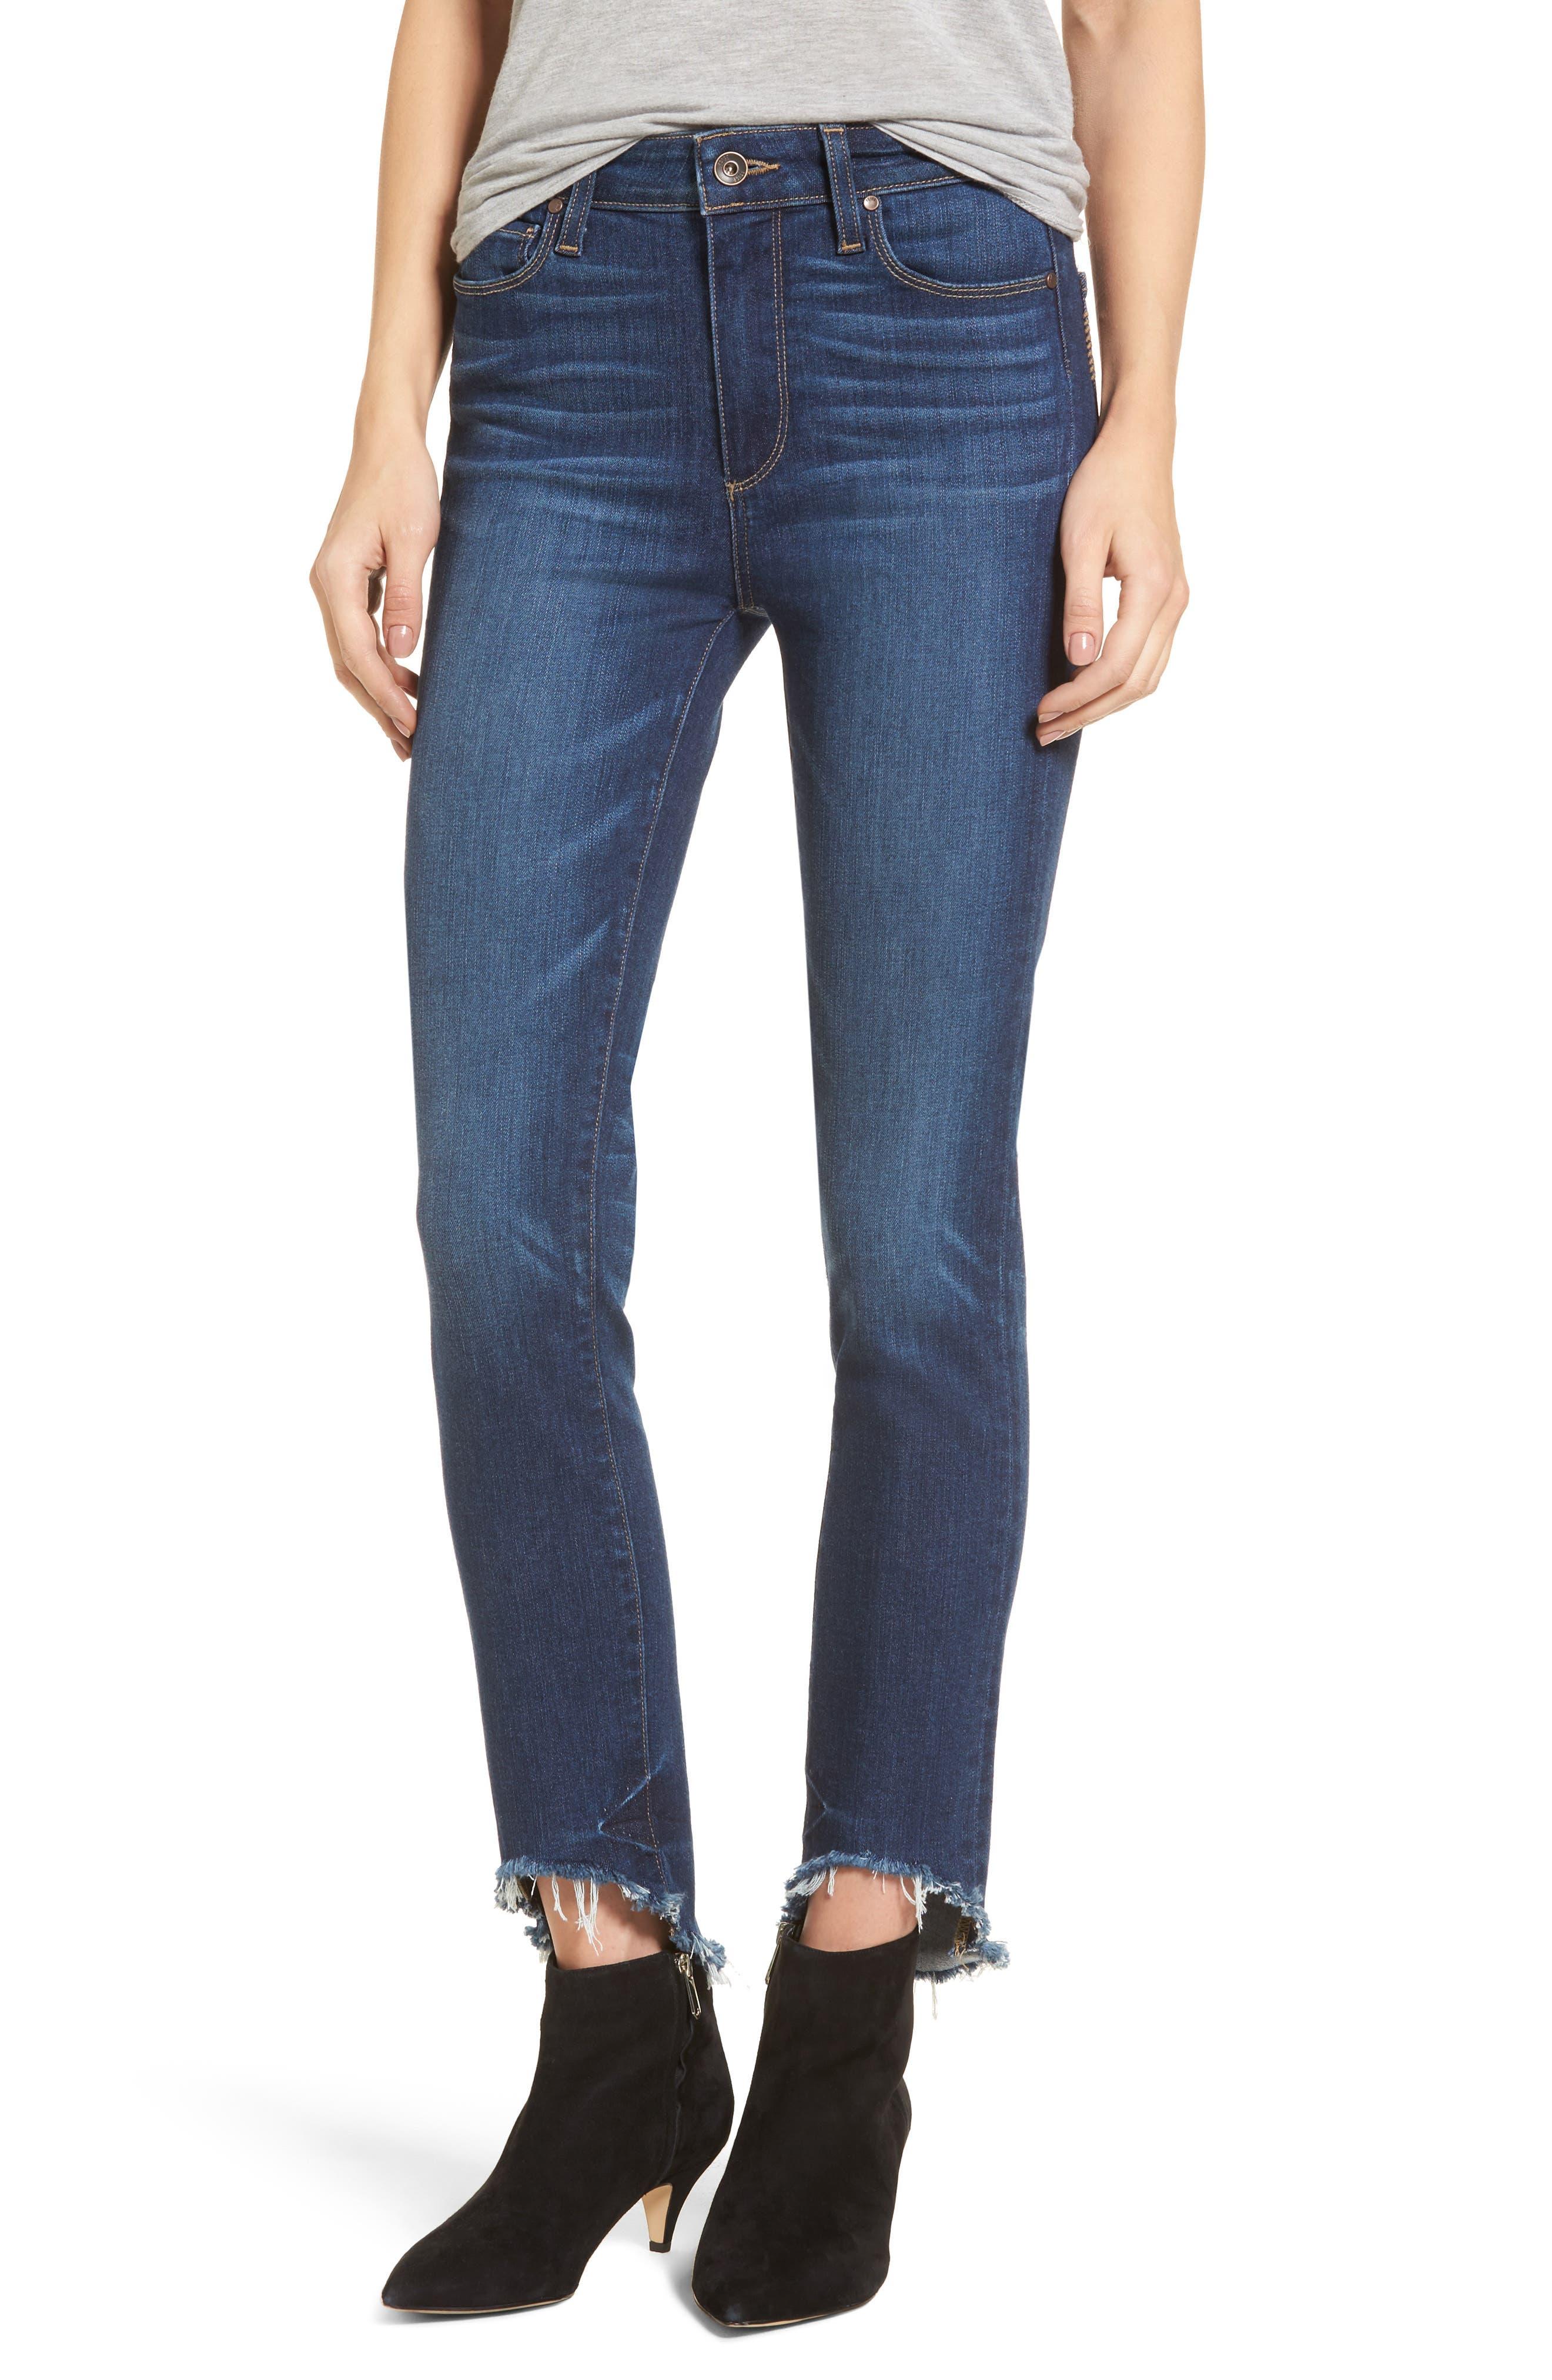 Transcend Vintage - Hoxton High Waist Ankle Skinny Jeans,                         Main,                         color, Auburn